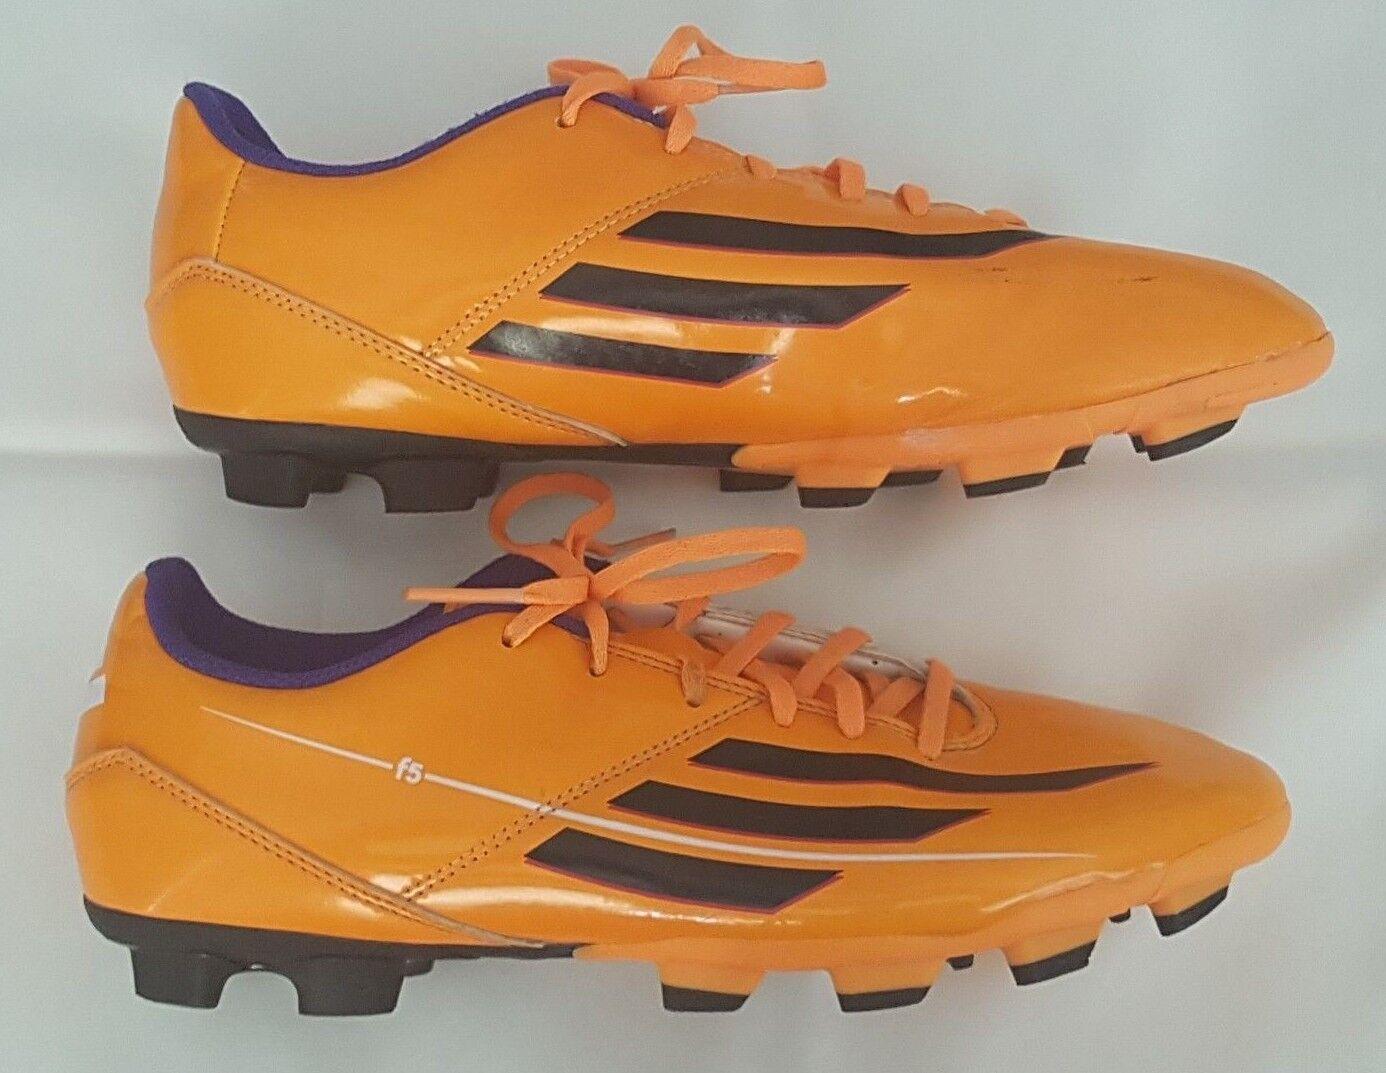 Adidas F5 Football Boots Mens US7 Cheap women's shoes women's shoes